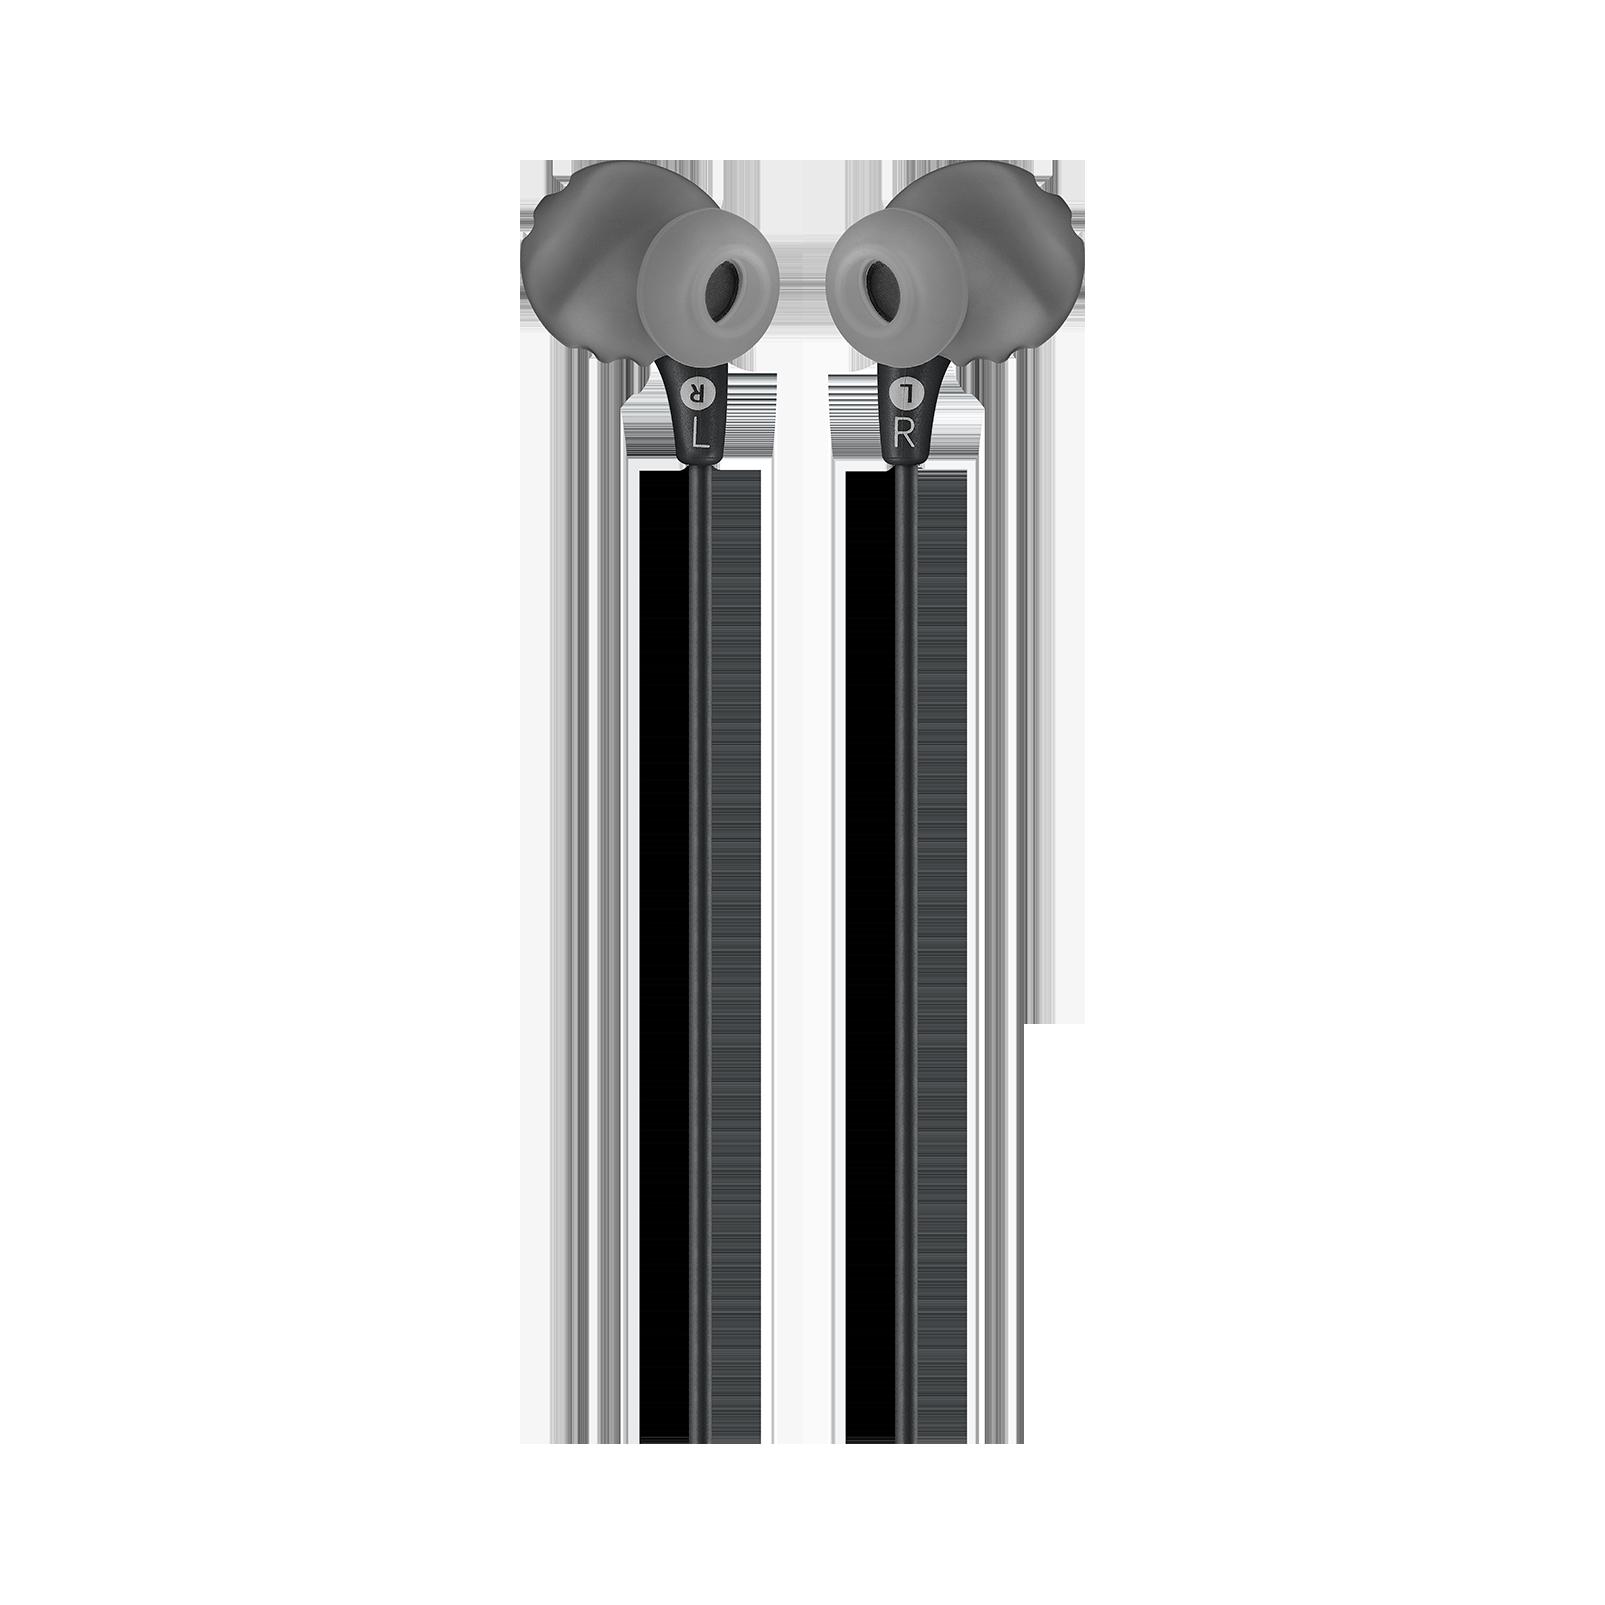 JBL Endurance RUN - Black - Sweatproof Wired Sport In-Ear Headphones - Back